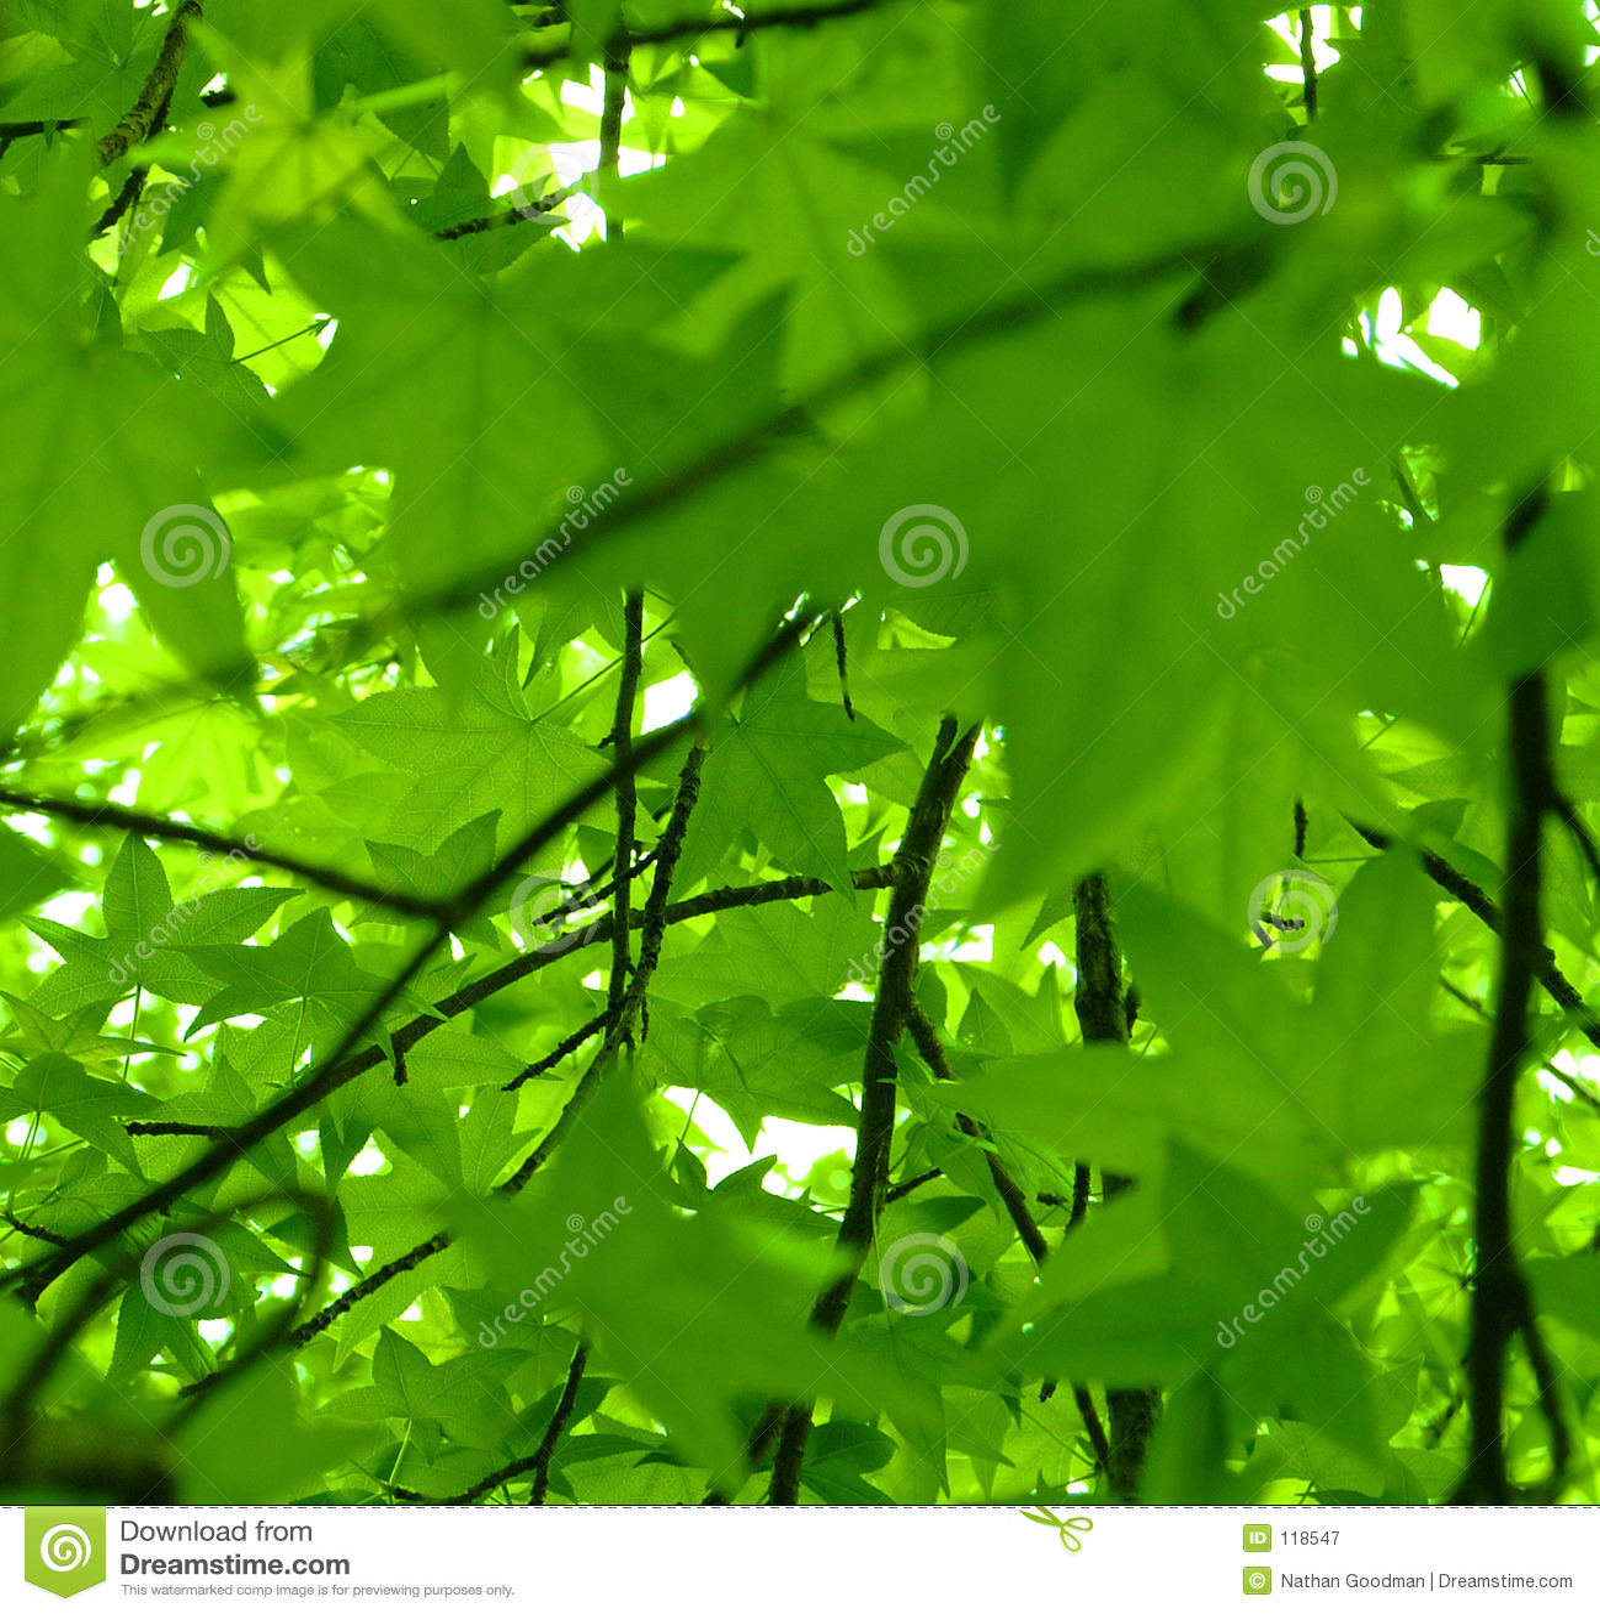 Leaf View of Spring. Sweet Gum (Liquidambar styraciflua)